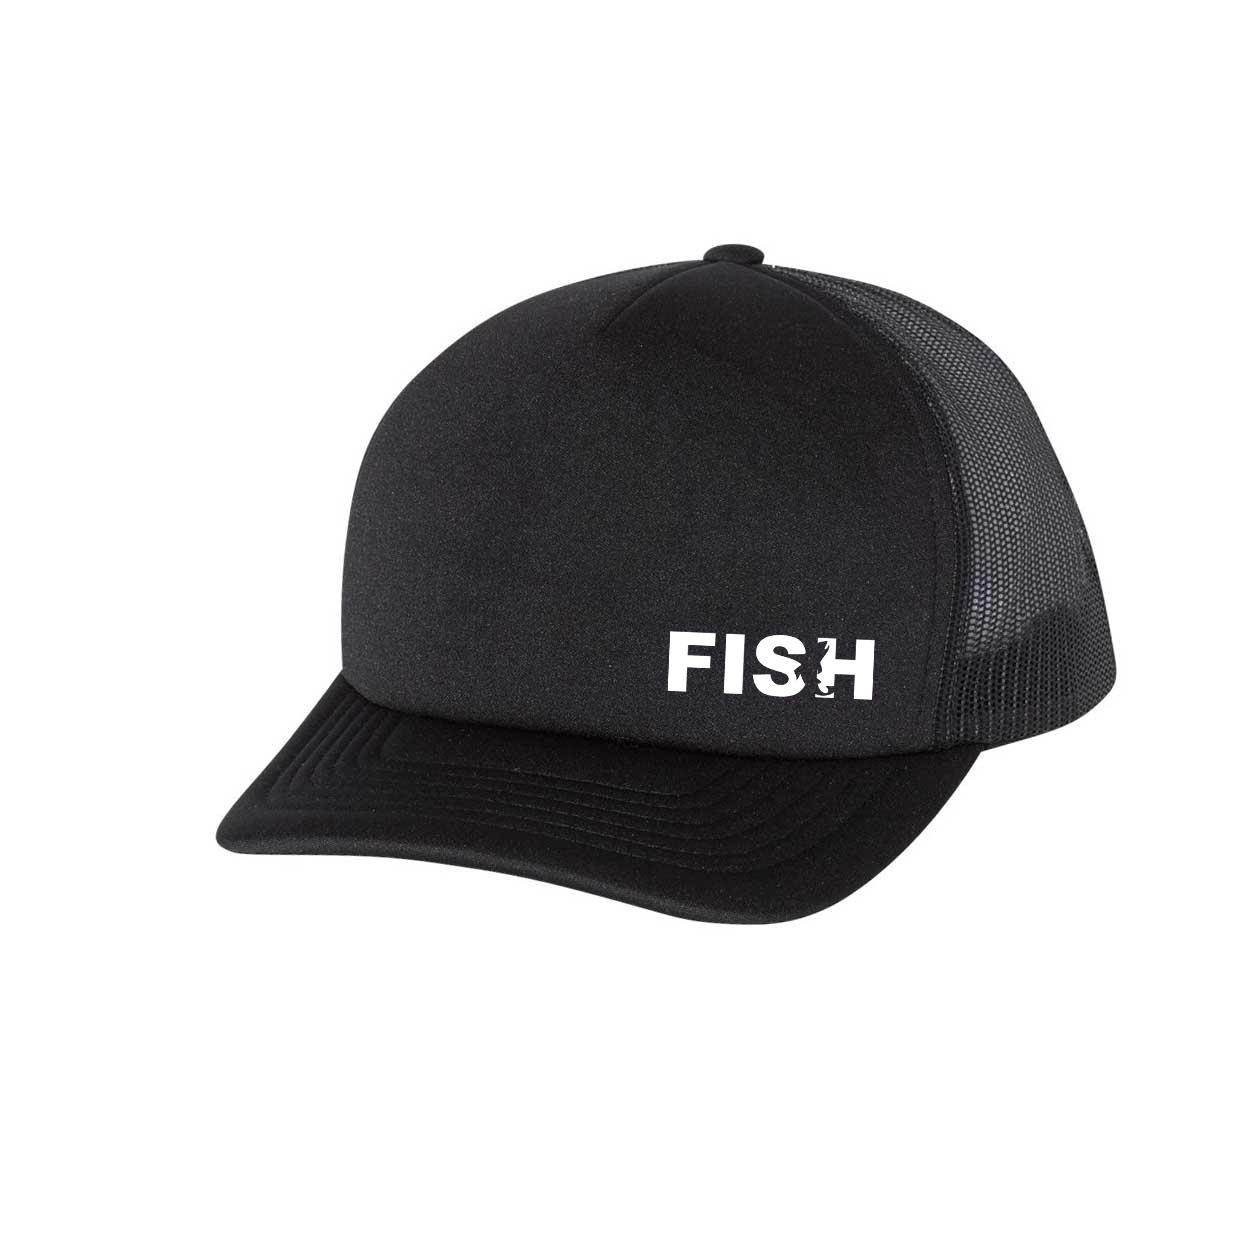 Fish Catch Logo Night Out Premium Foam Trucker Snapback Hat Black (White Logo)